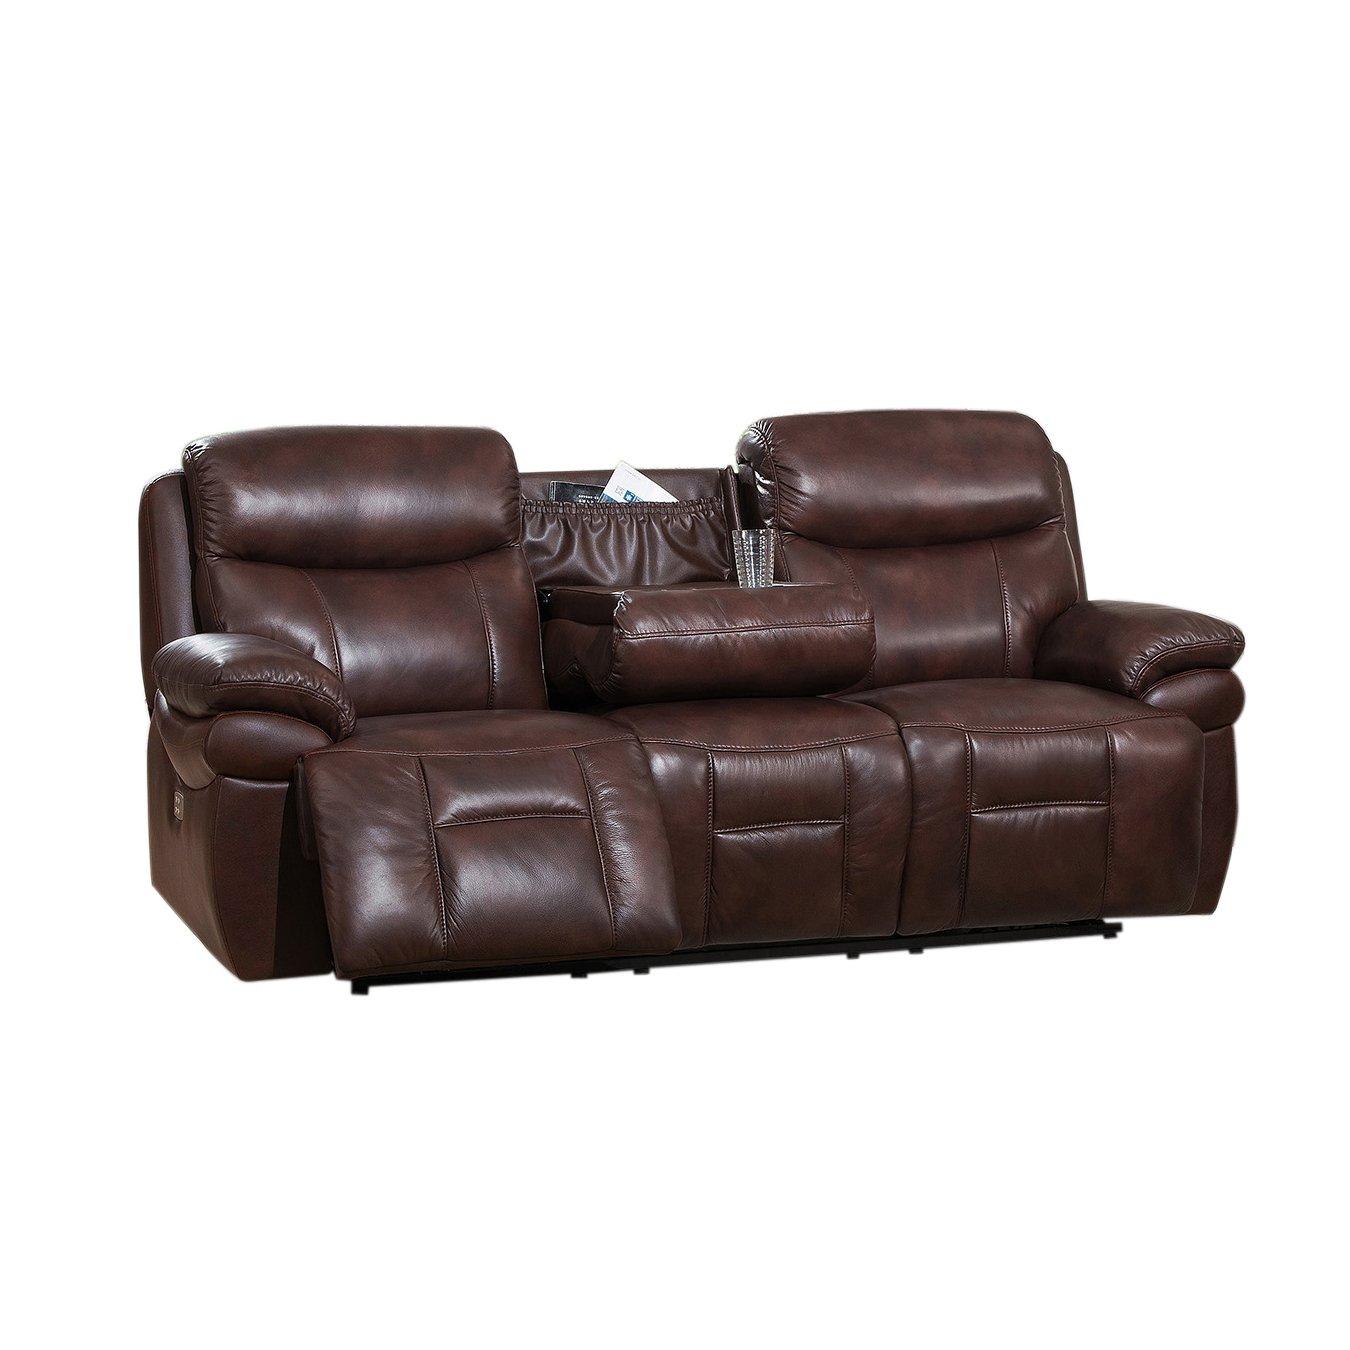 Amazon.com: Coja by Sofa4life Sentinel Leather Sofa ...